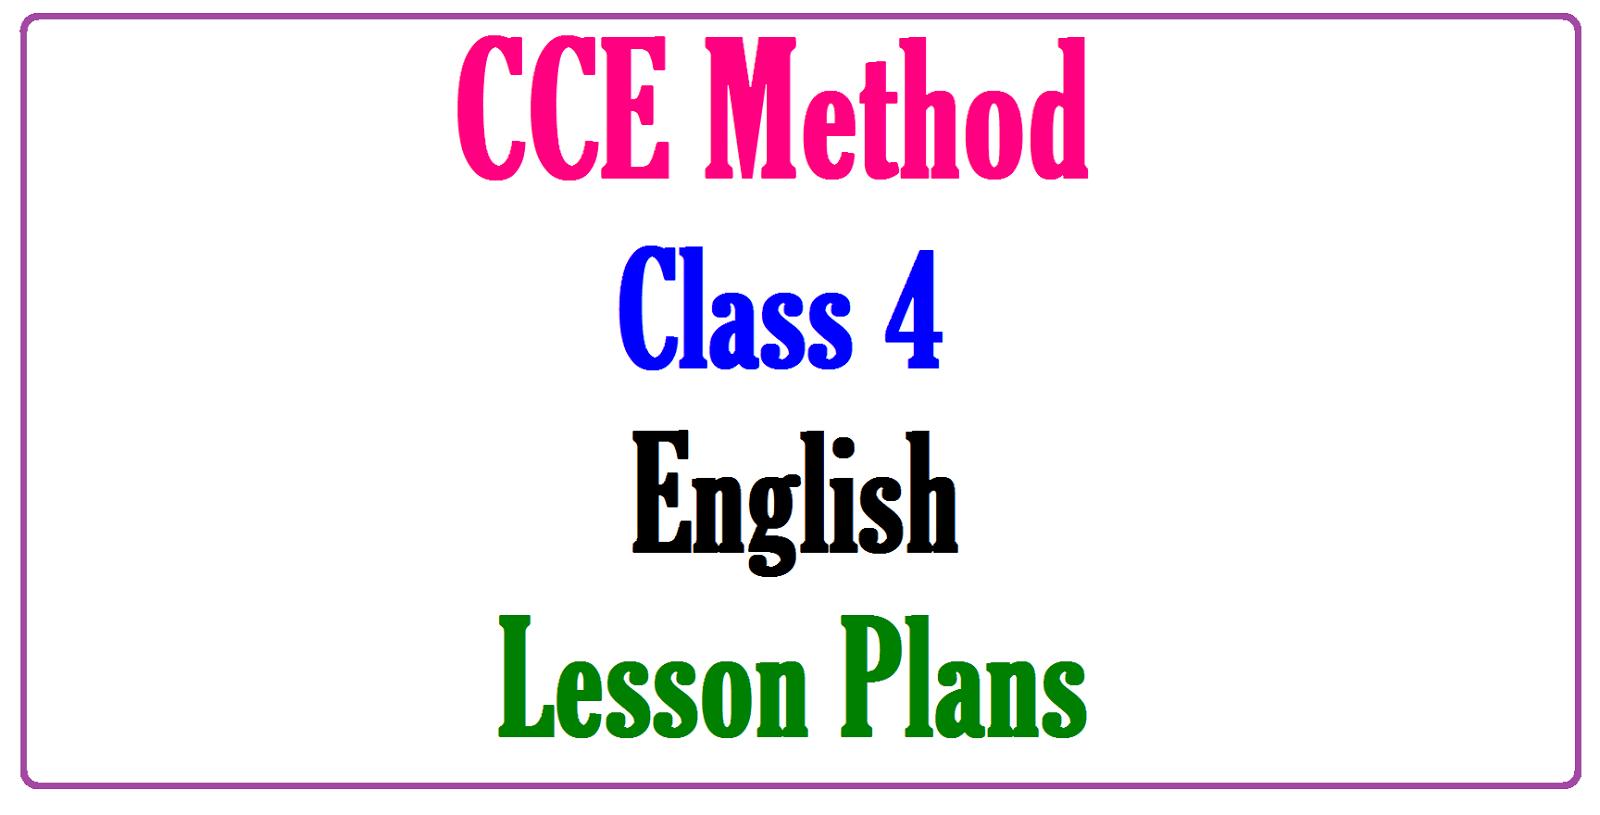 Kv Class 4 English Worksheets